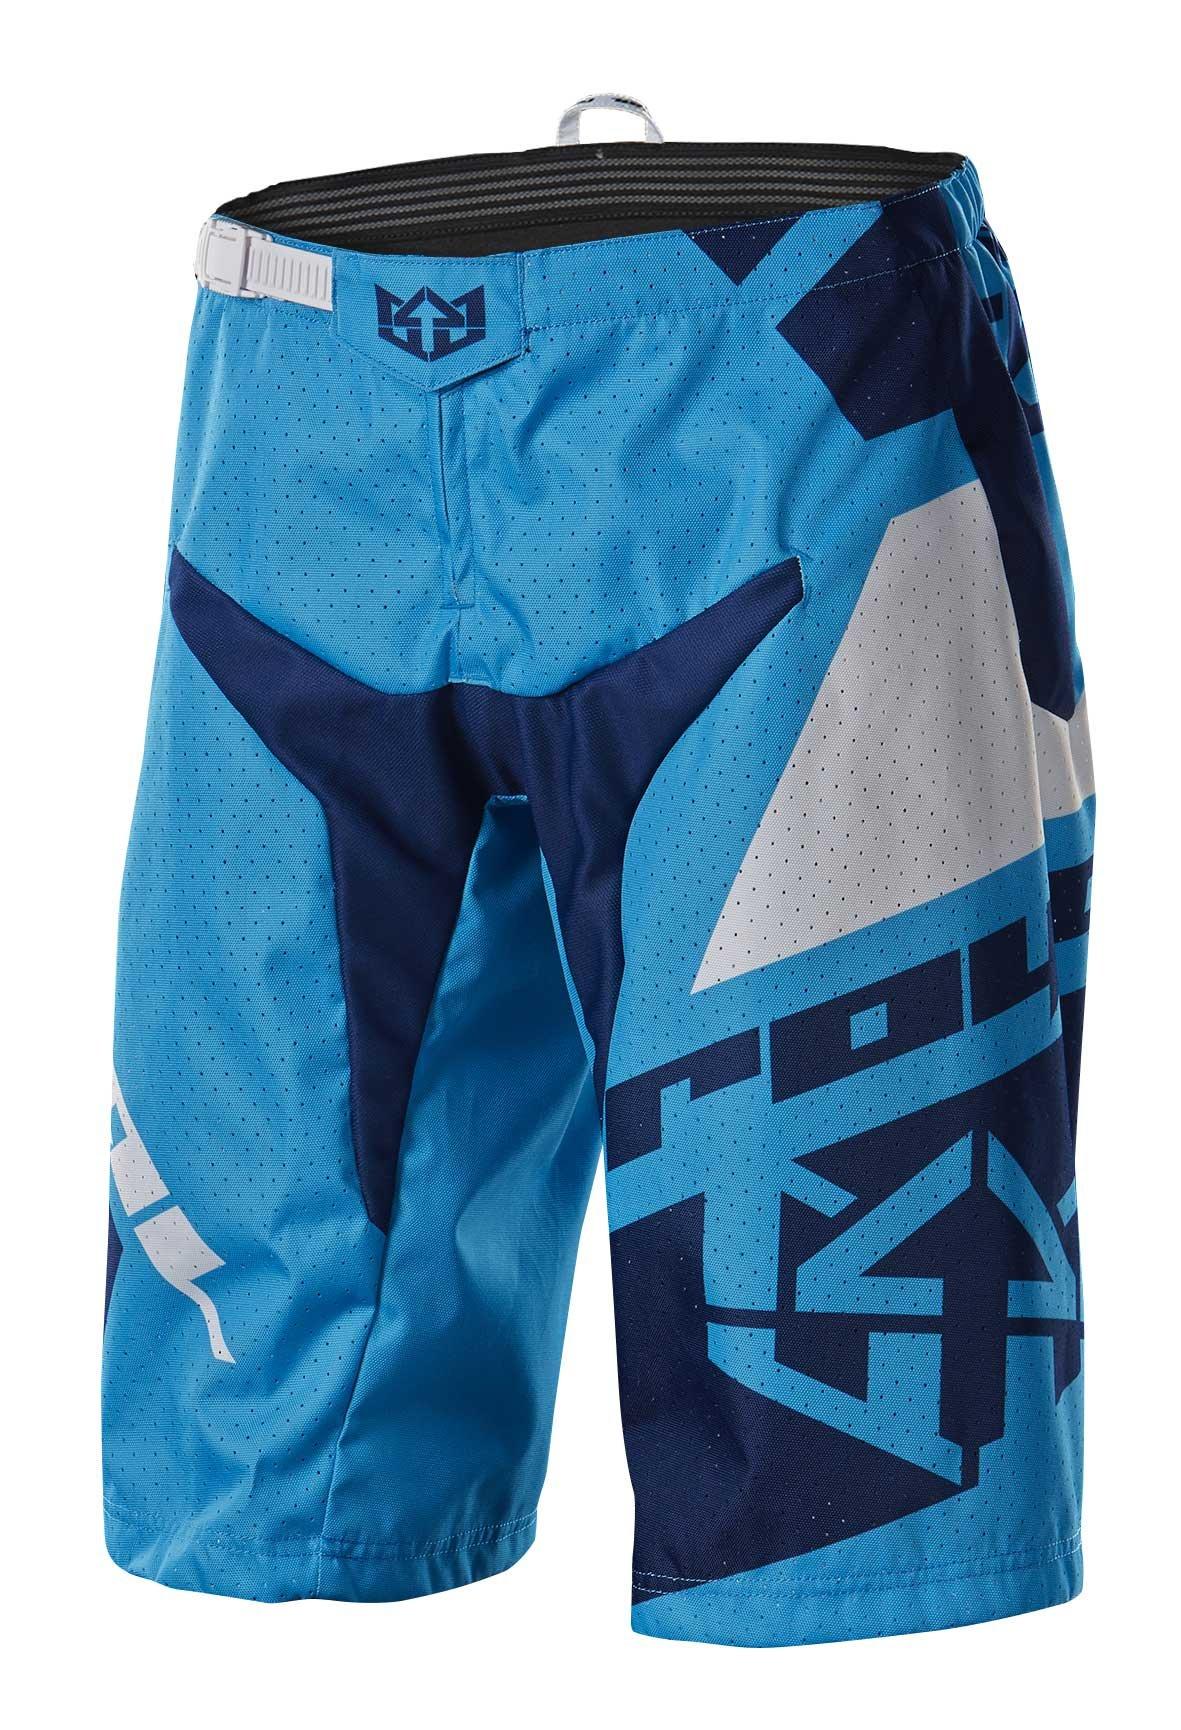 Royal Racing Victory Race Shorts, Cyan Blue/Navy Blue/White, Medium